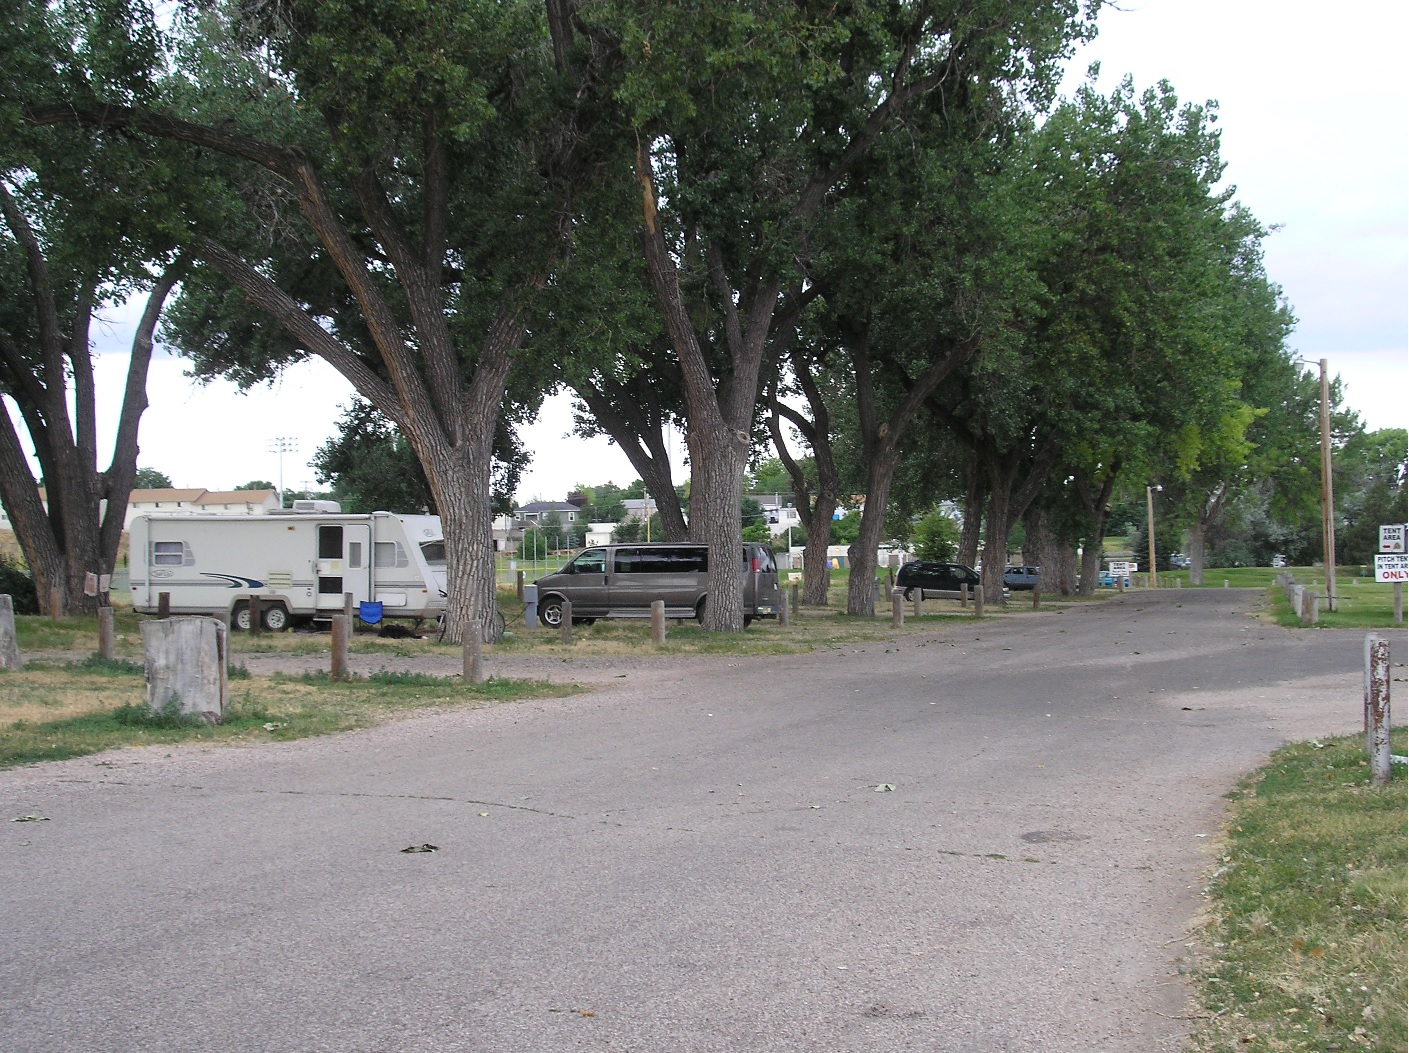 Lewis Park Wyoming RV Camping